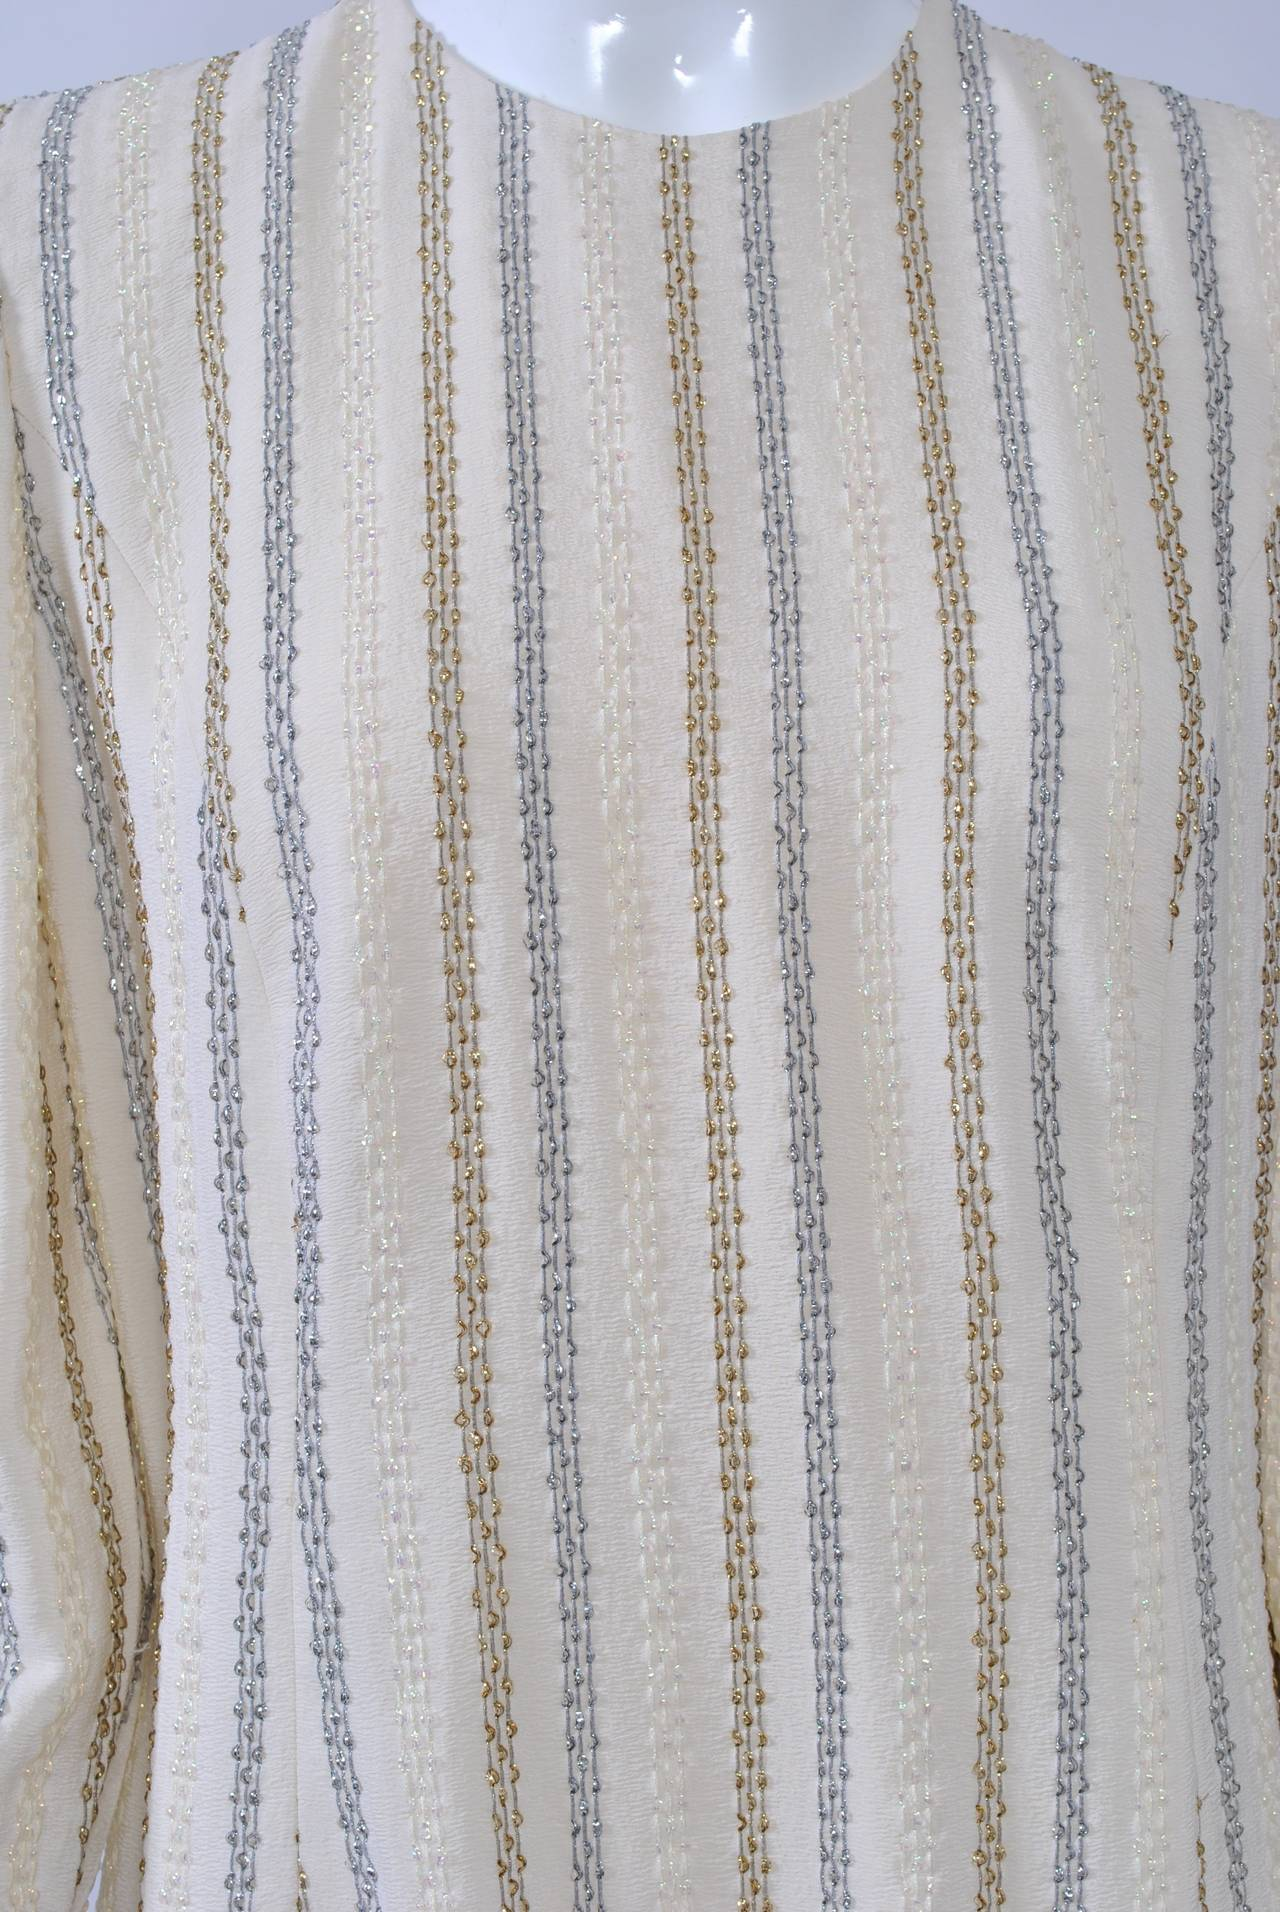 Carolina Herrera Ivory and Metallic Dress 5